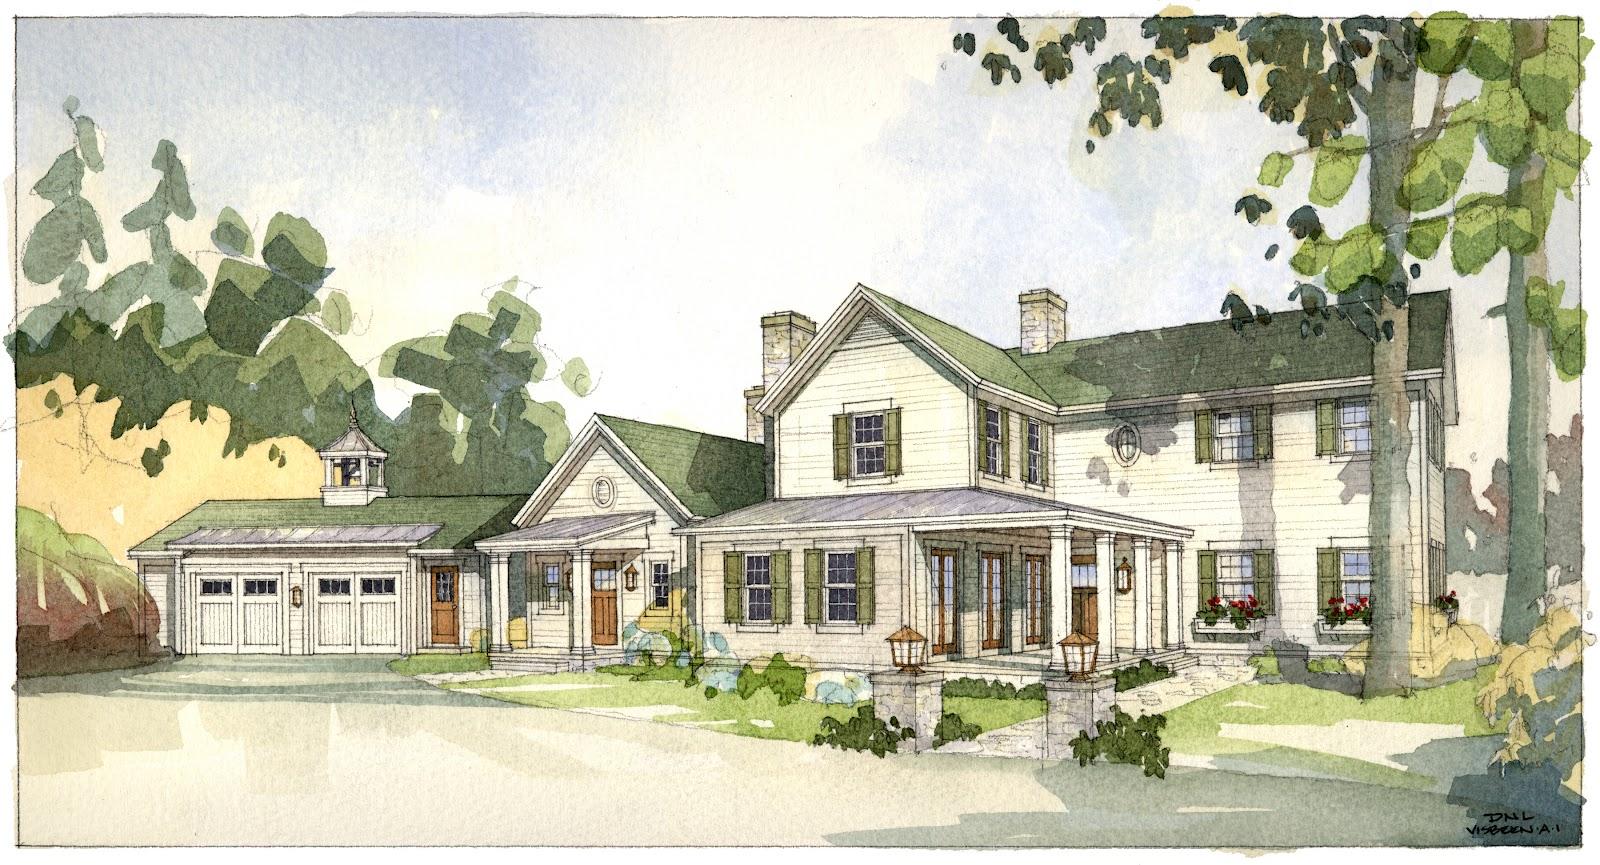 Architectural tutorial the american farmhouse visbeen for American farmhouse style architecture